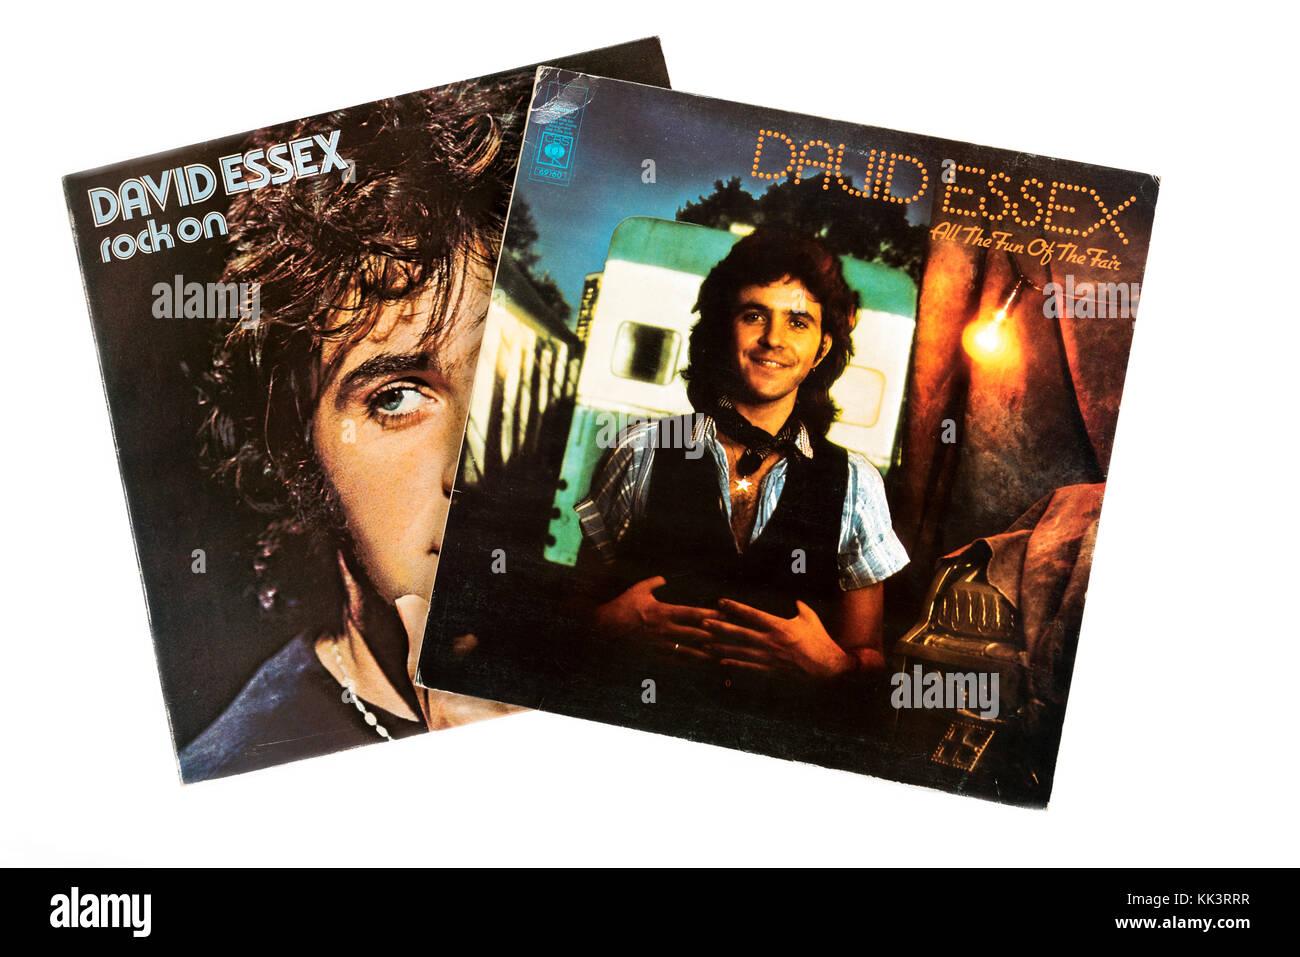 David Essex Stock Photos & David Essex Stock Images - Alamy